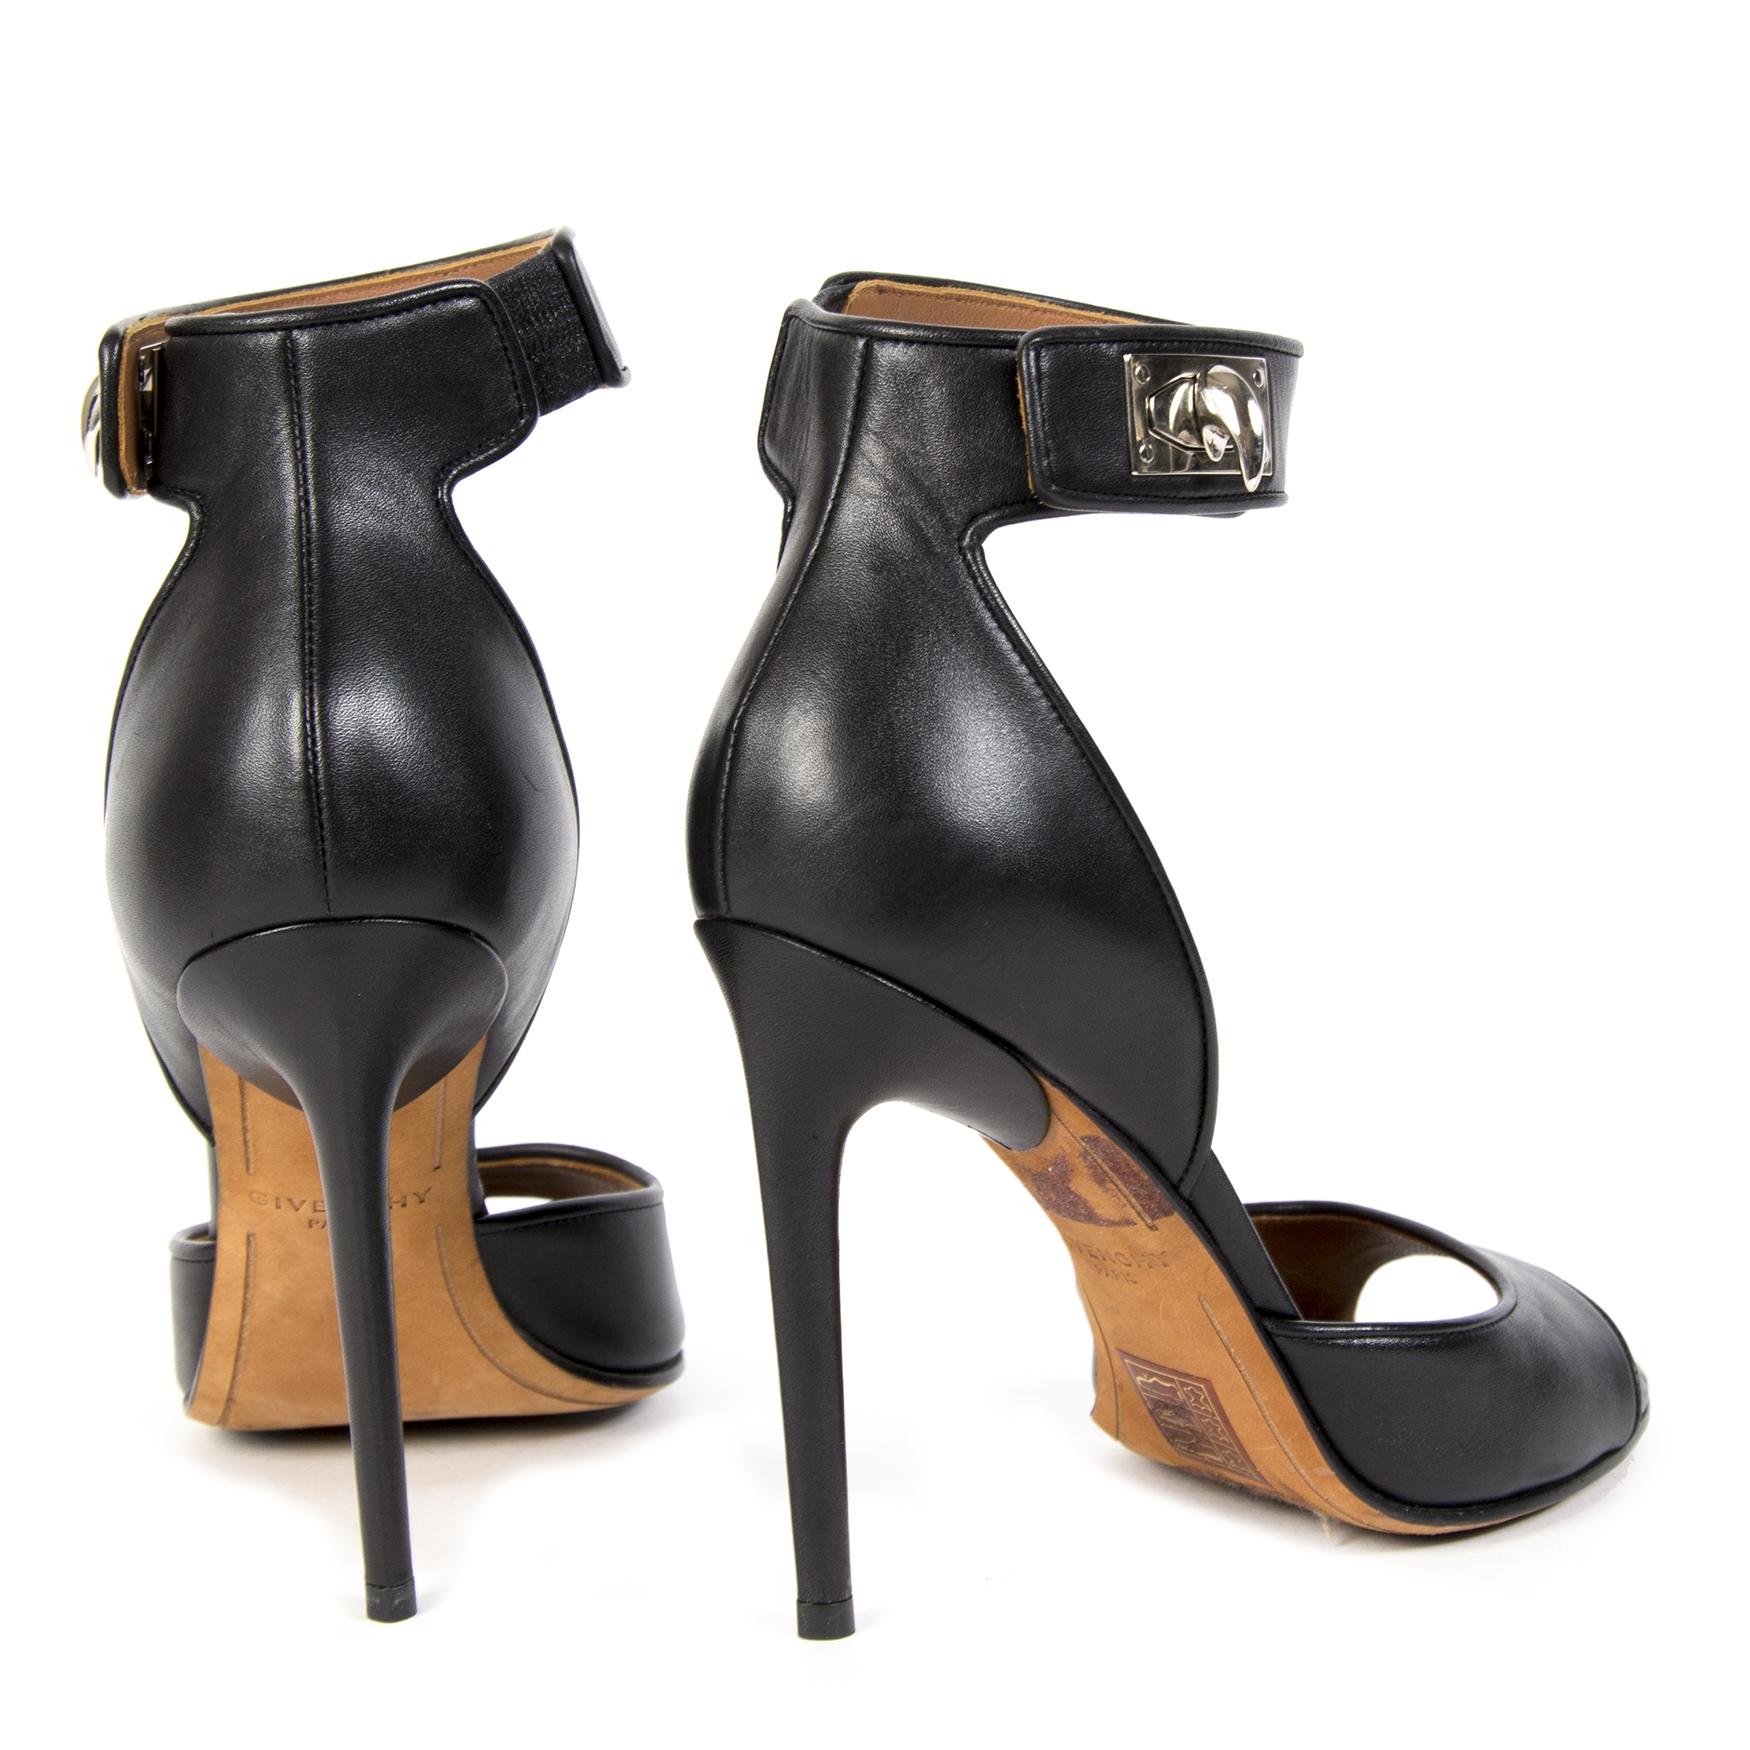 100% authentic Givenchy Shark Sandal Pumps - Size 36,5